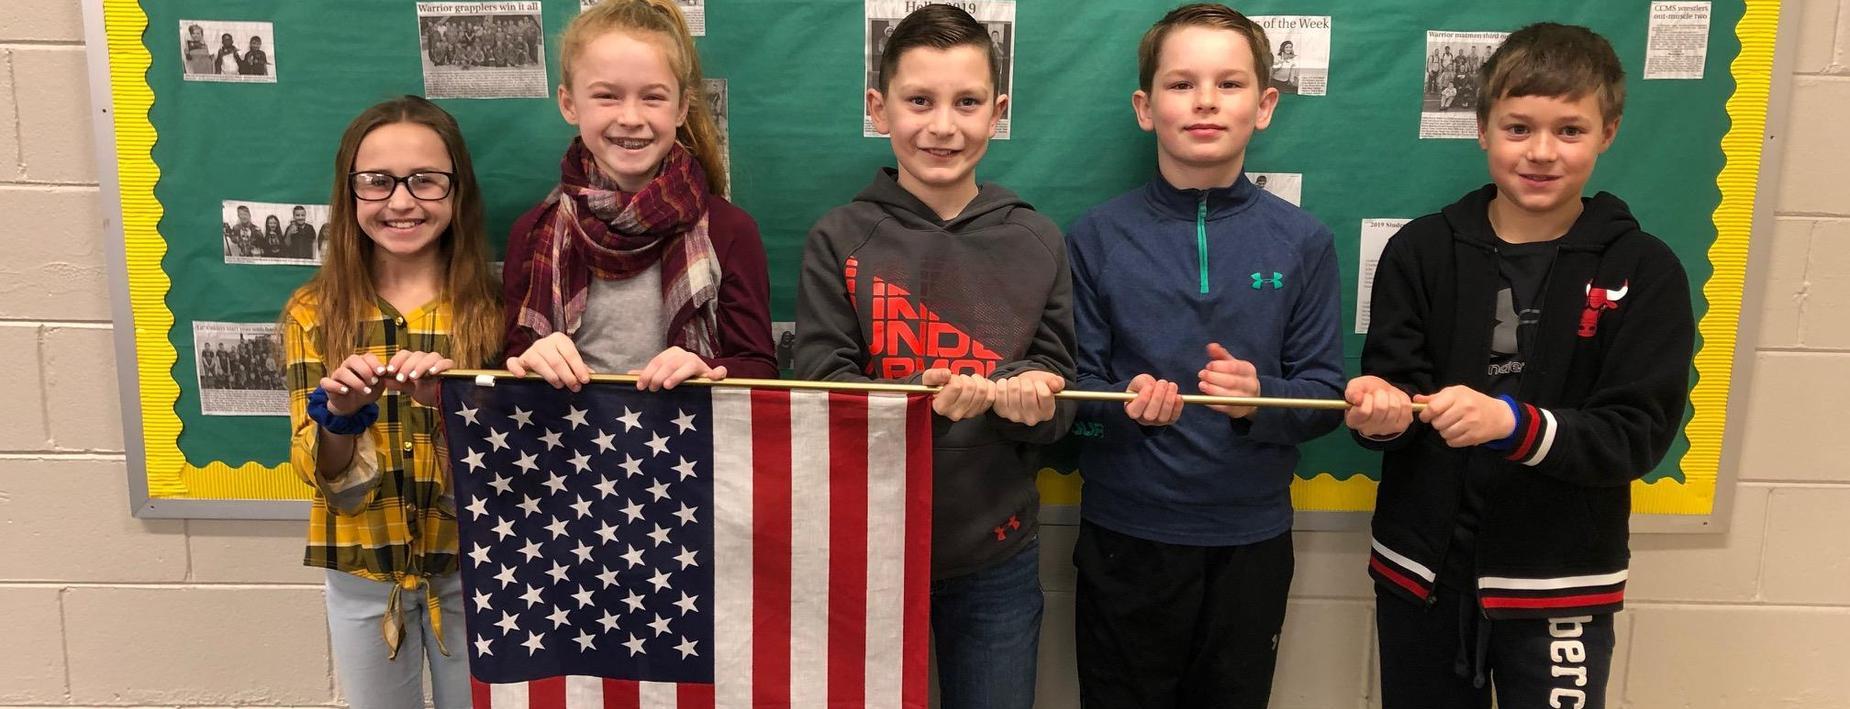 Pledging allegiance to the flag